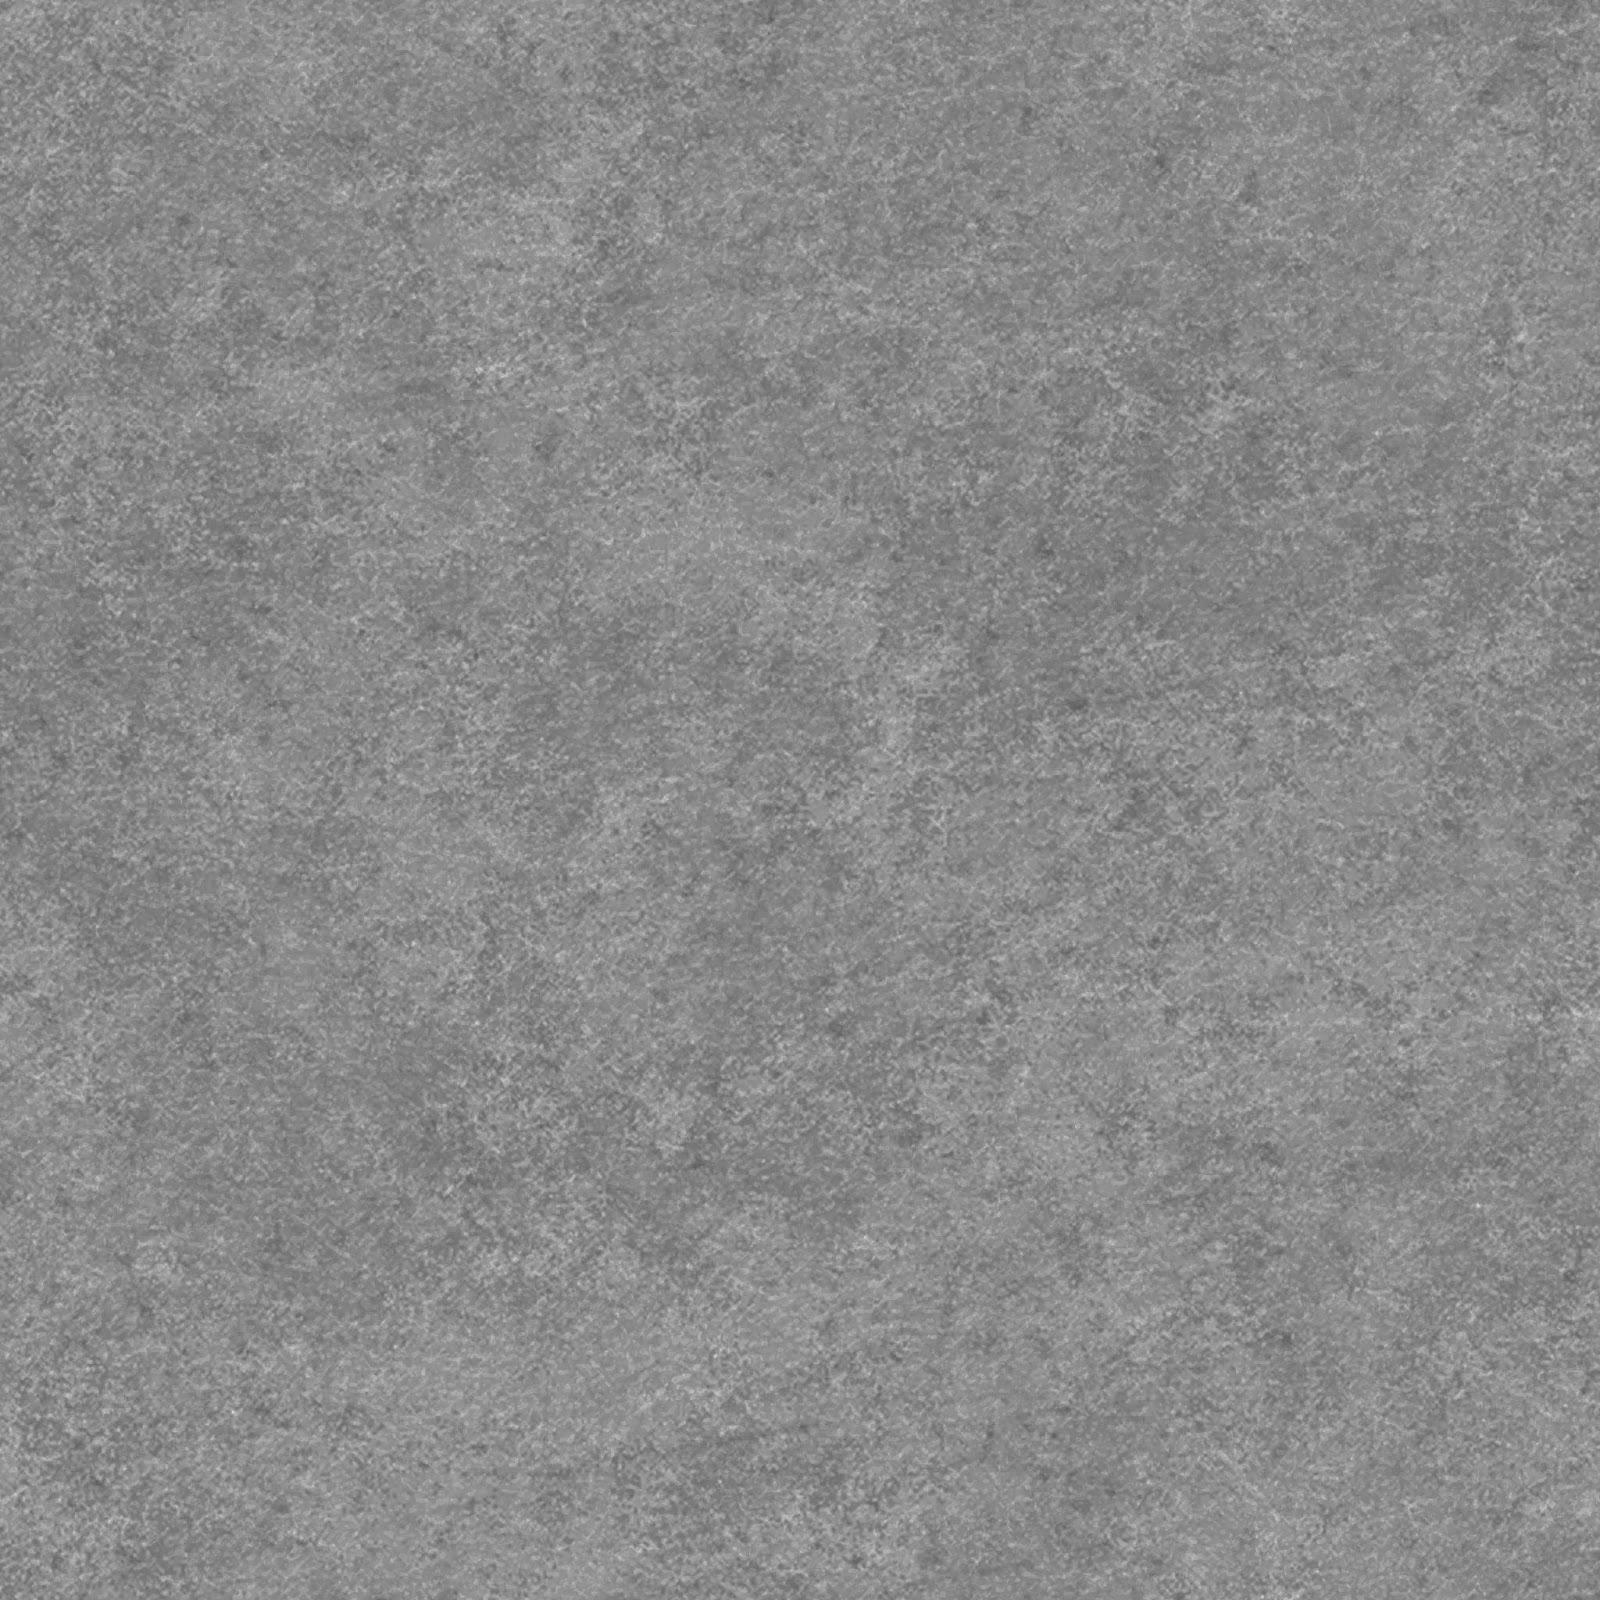 Seamless metal wall texture Rustic Metal Tileable Metal Texture 16 Seamless Pixels High Resolution Seamless Textures Tileable Metal Texture 16